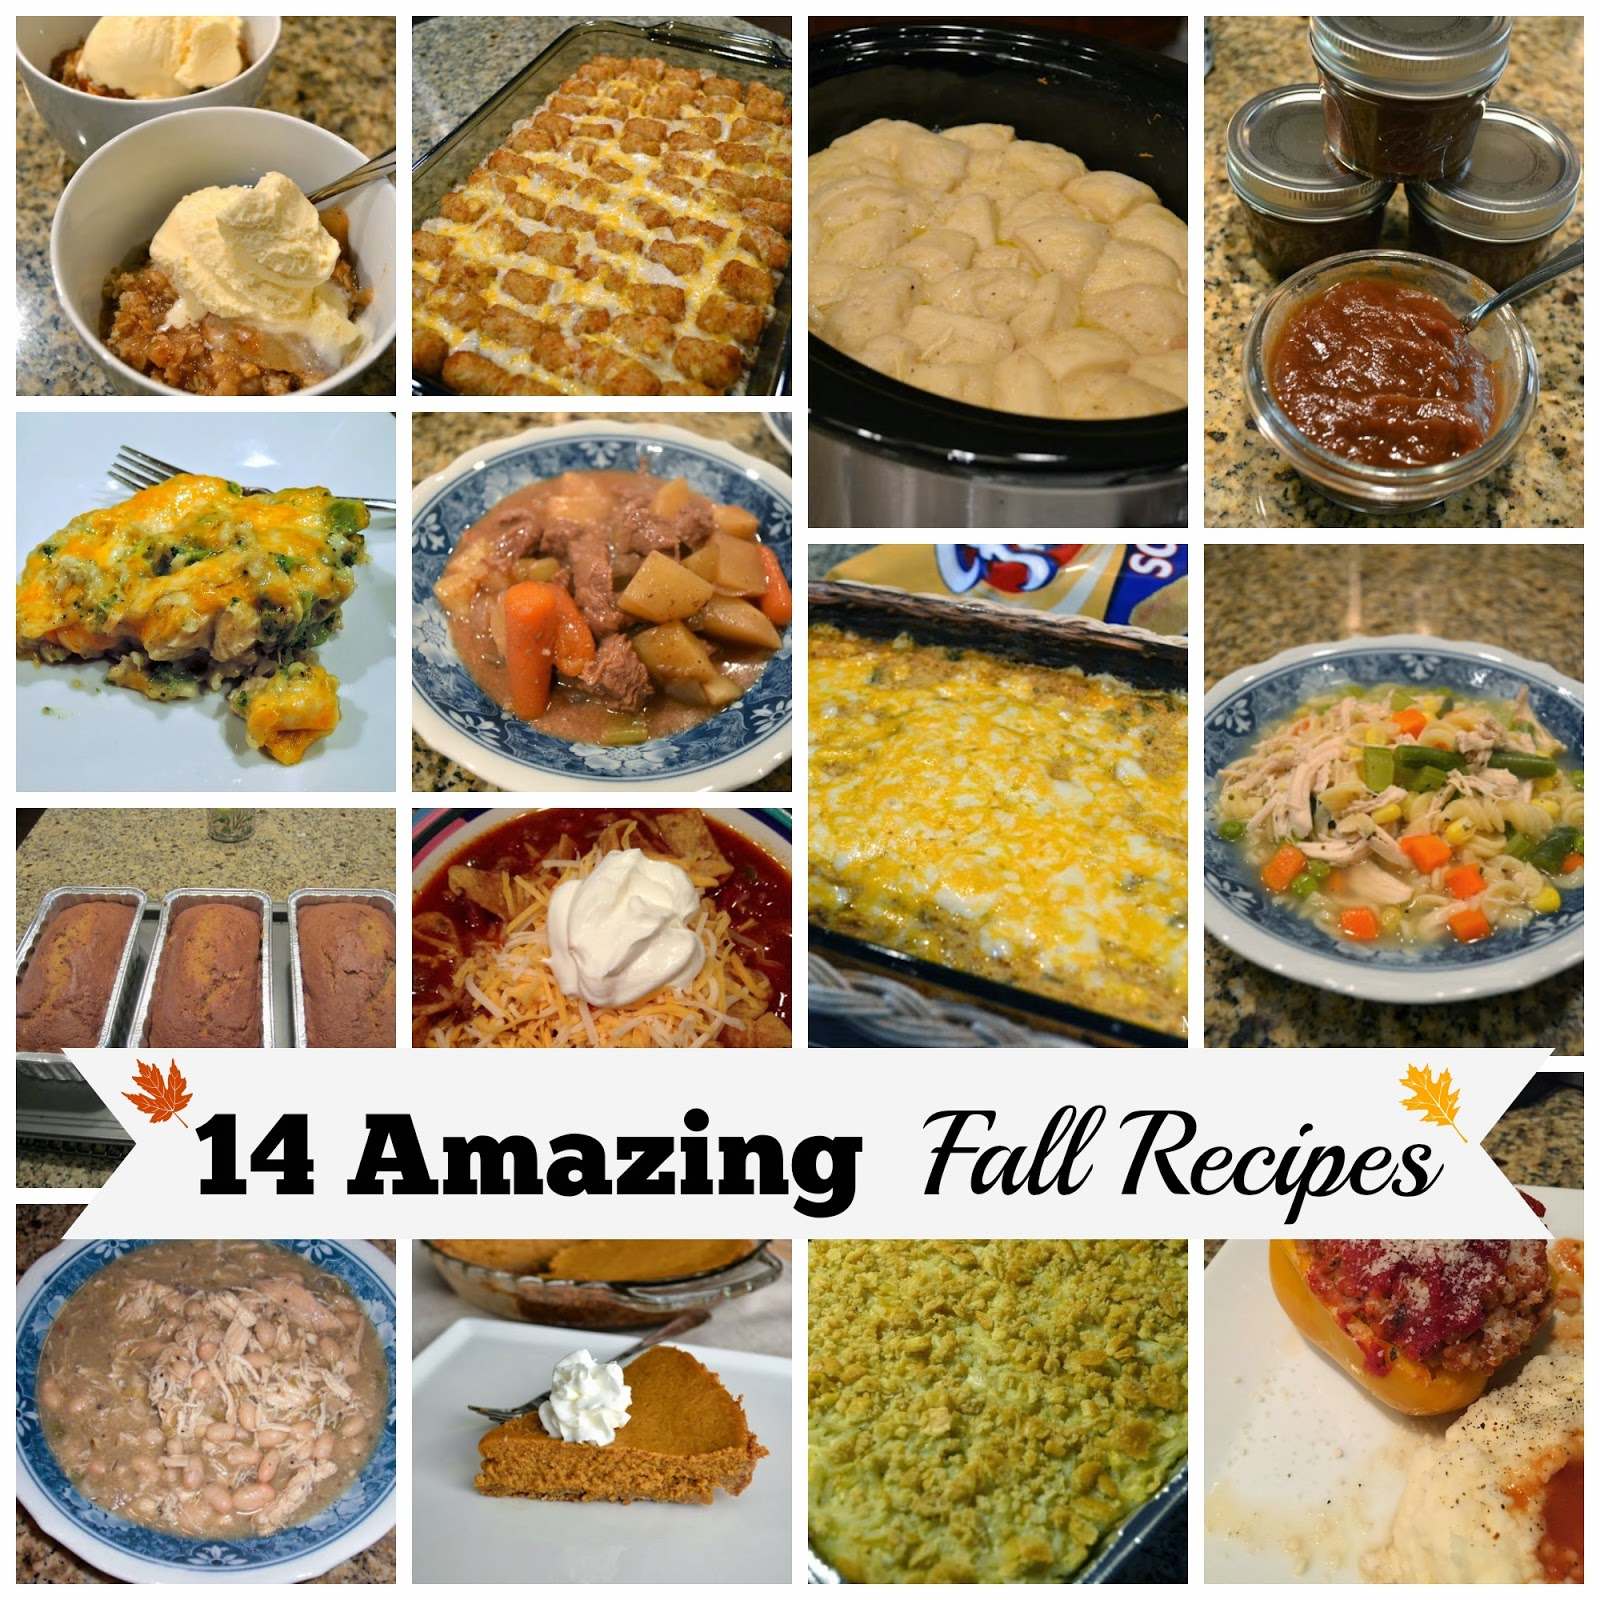 14 Amazing Fall Recipes